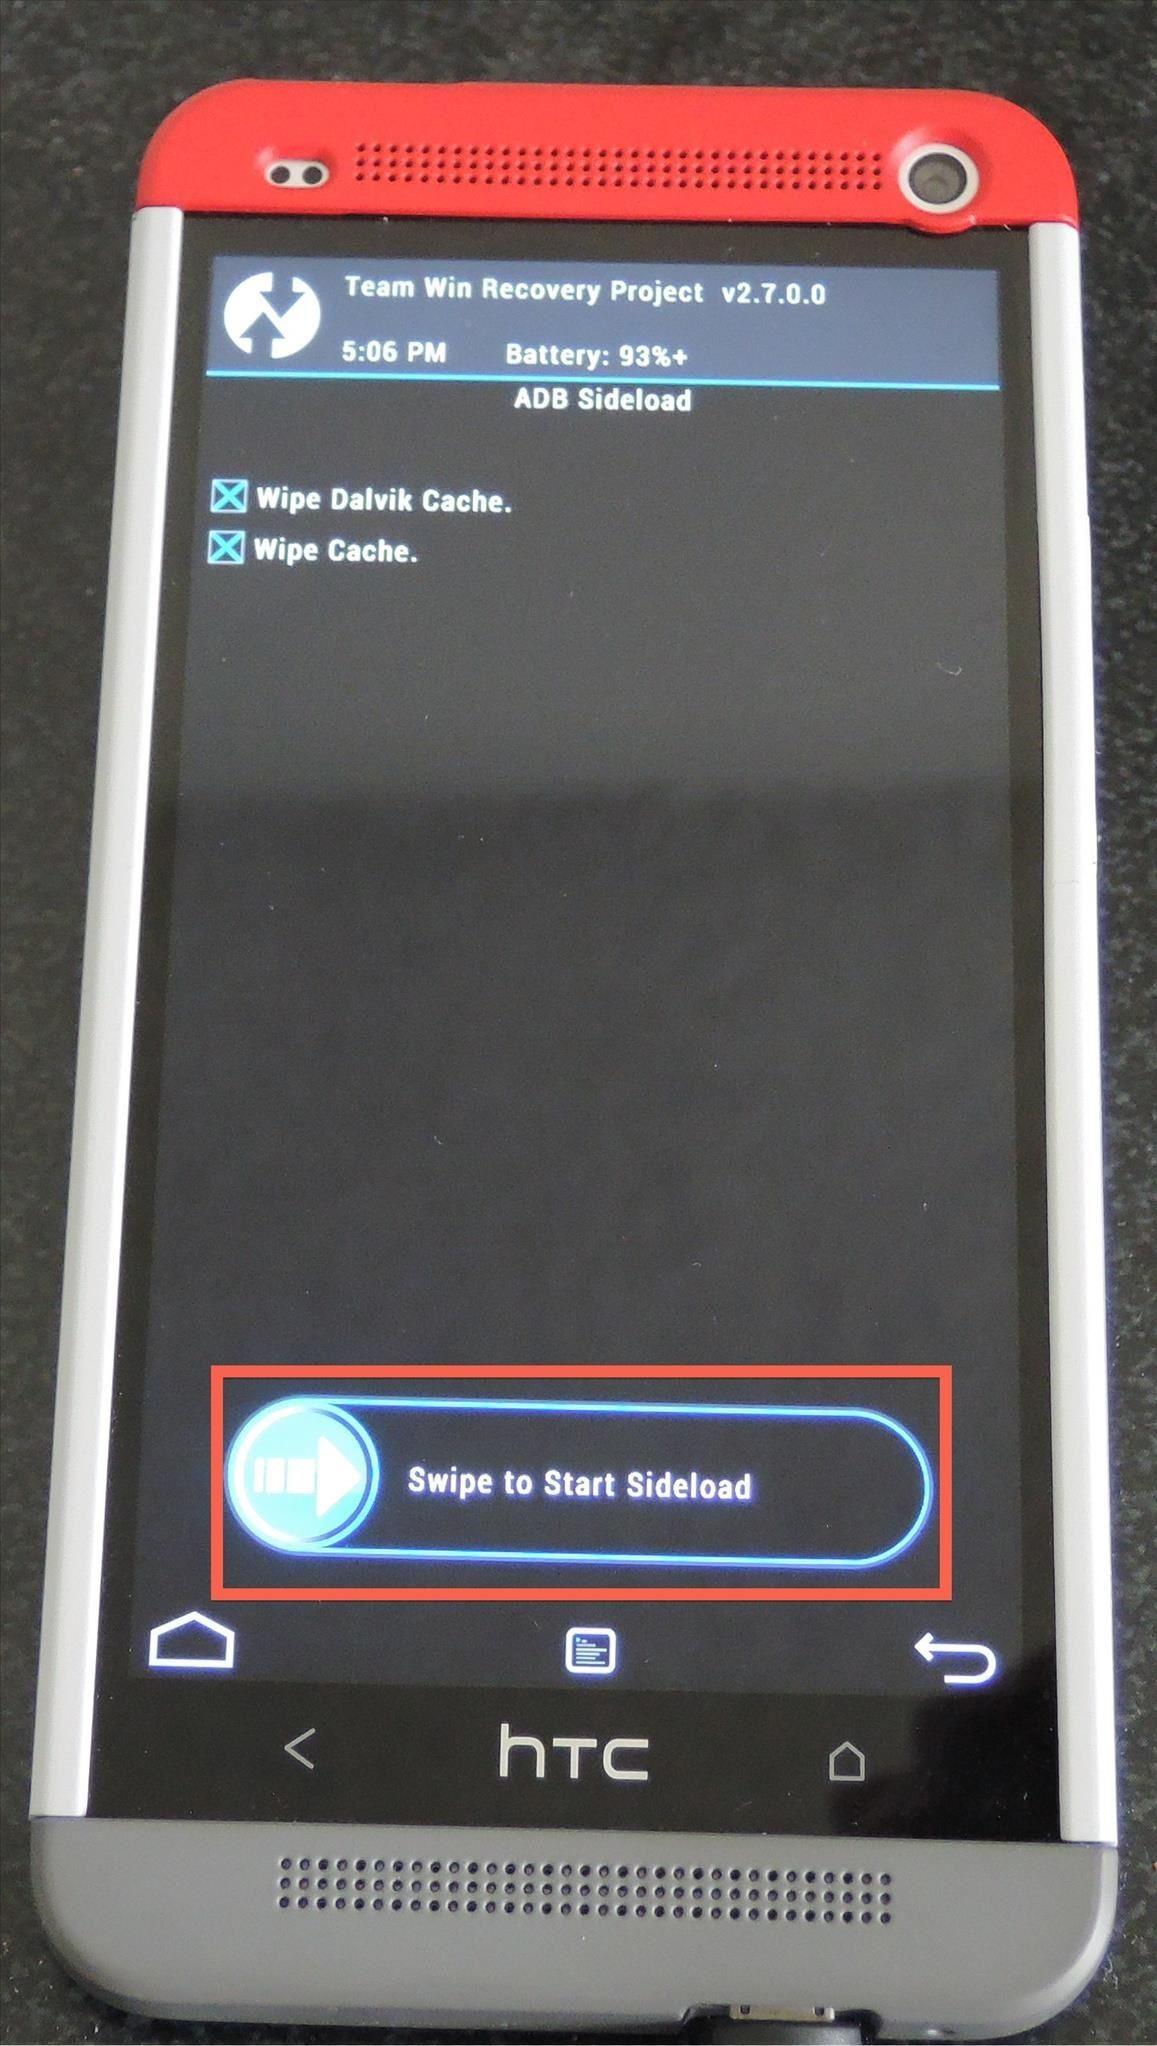 How to Fix a Soft-Bricked HTC One by Flashing a New ROM via ADB